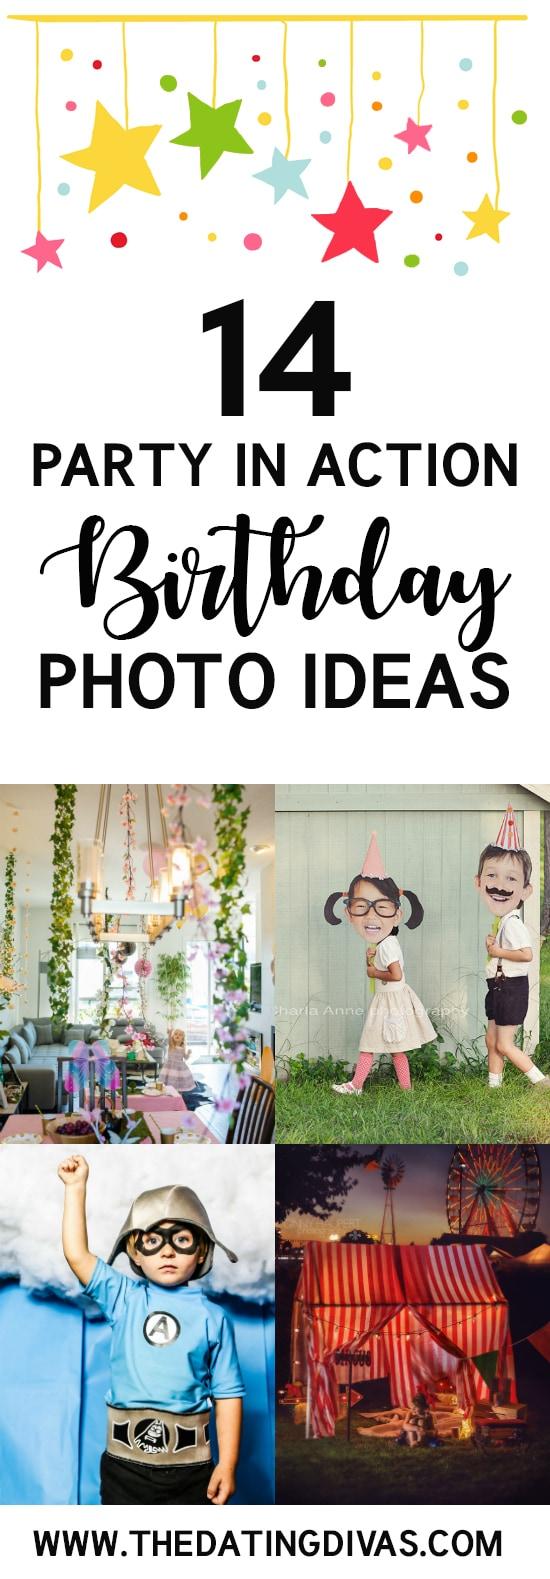 101 Birthday Photo Ideas - The Dating Divas